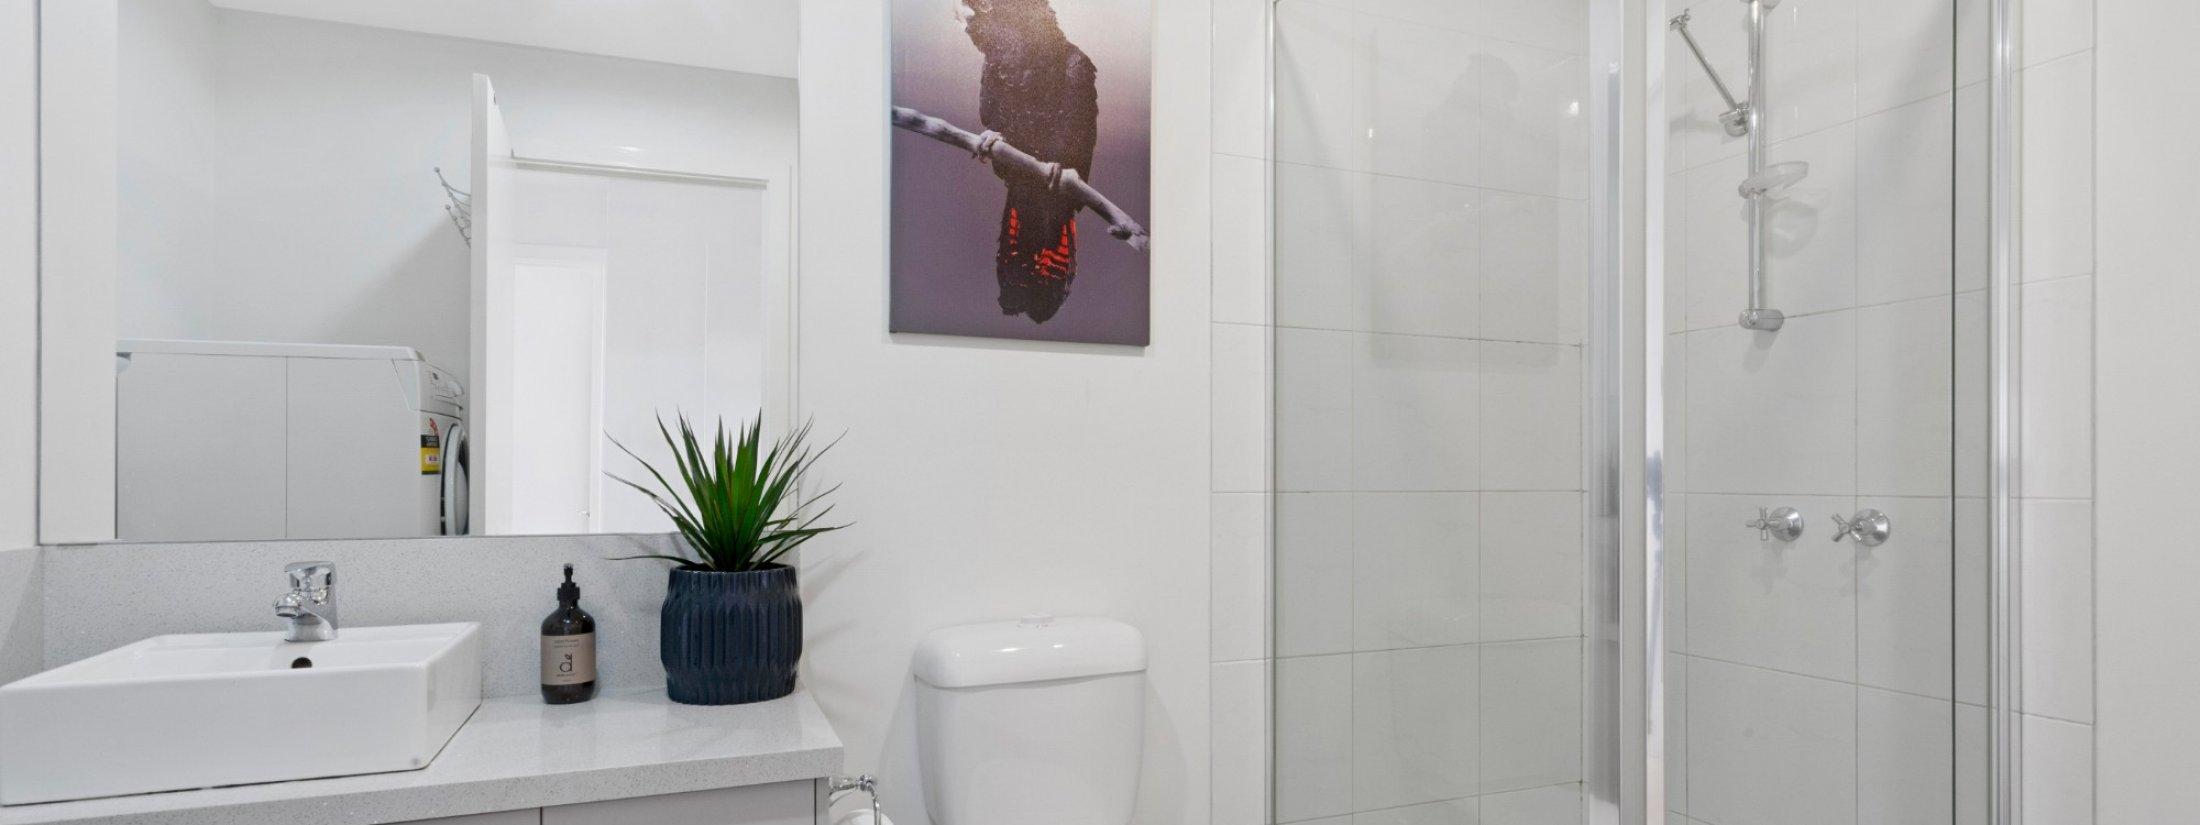 Manallack Apartments Boyd - Melbourne - Bathroom 1